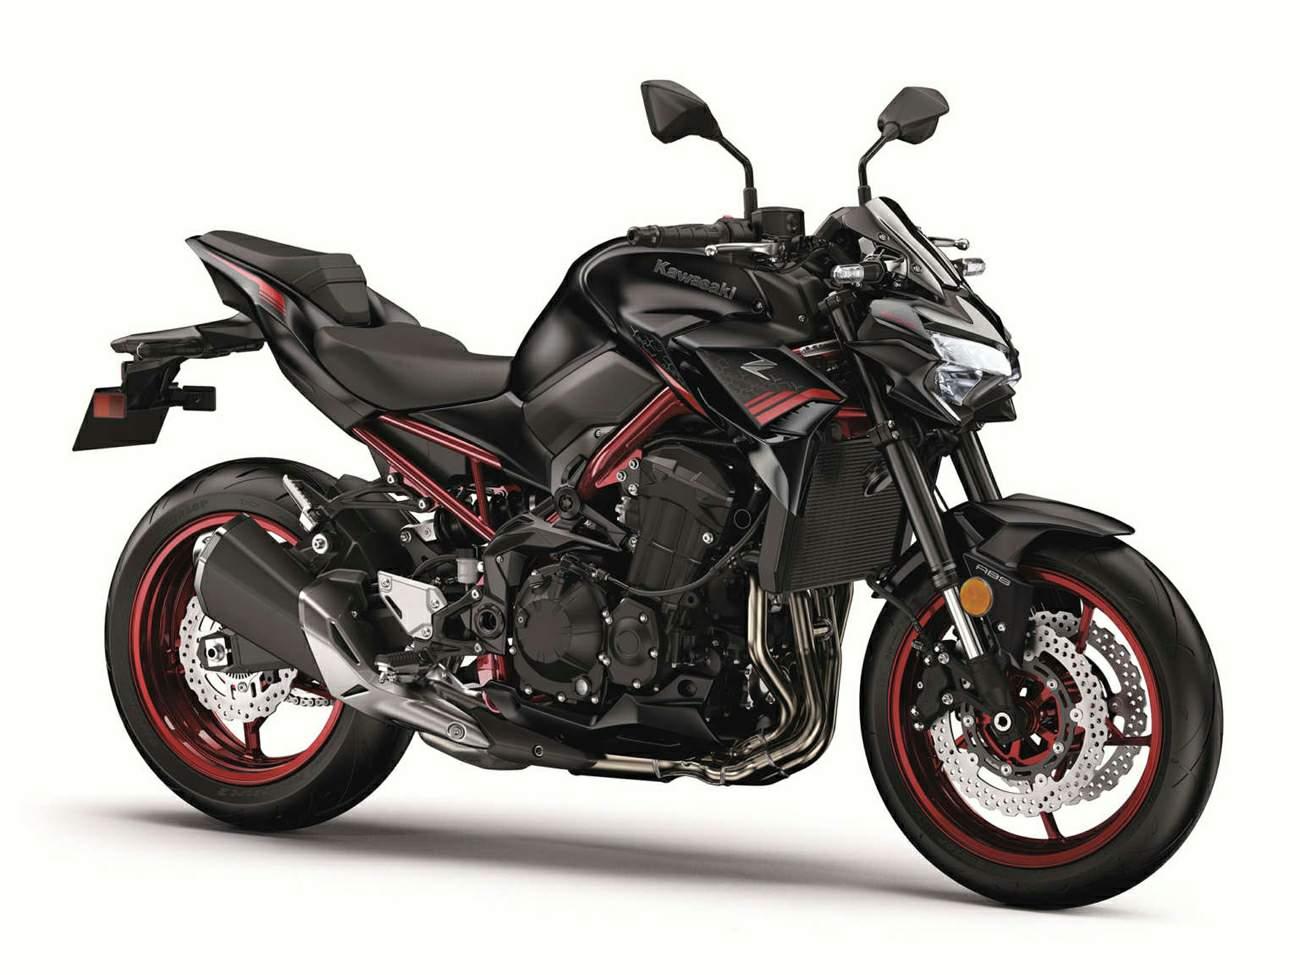 Kawasaki Z 900 technical specifications